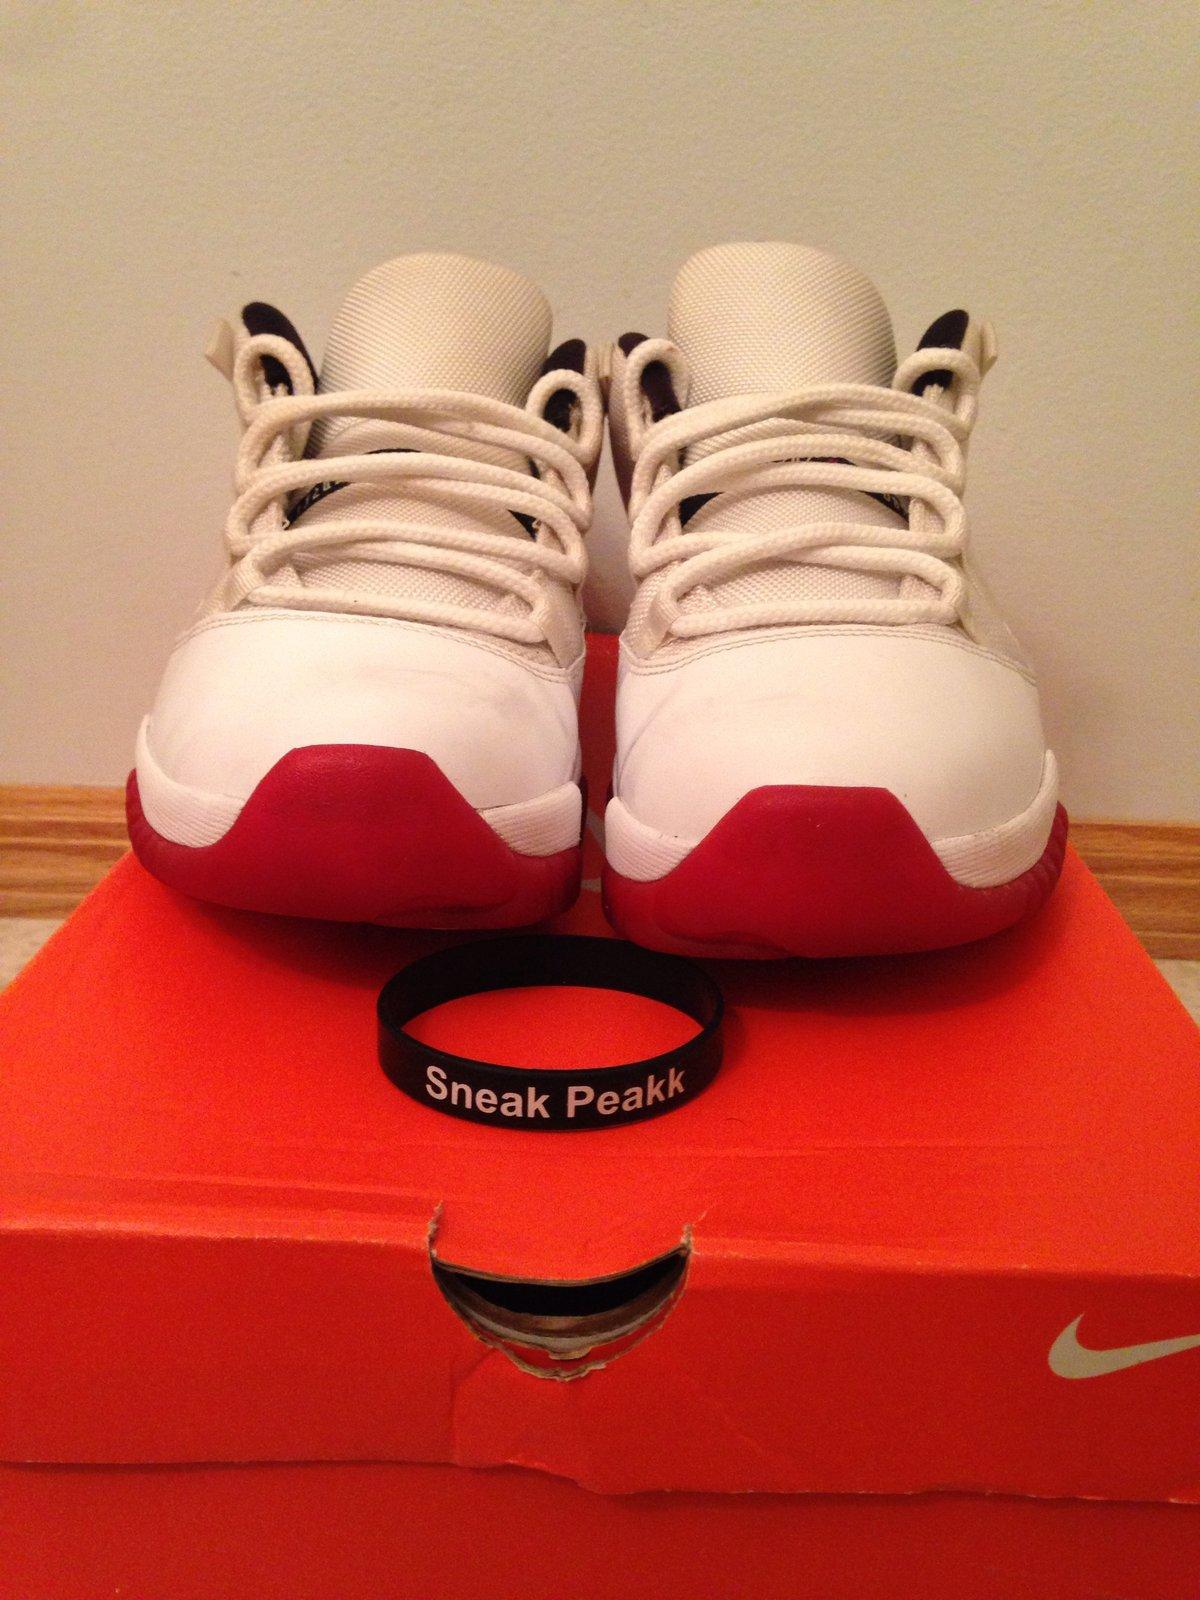 Nike Air Jordan 11 Low Cherry Size 12